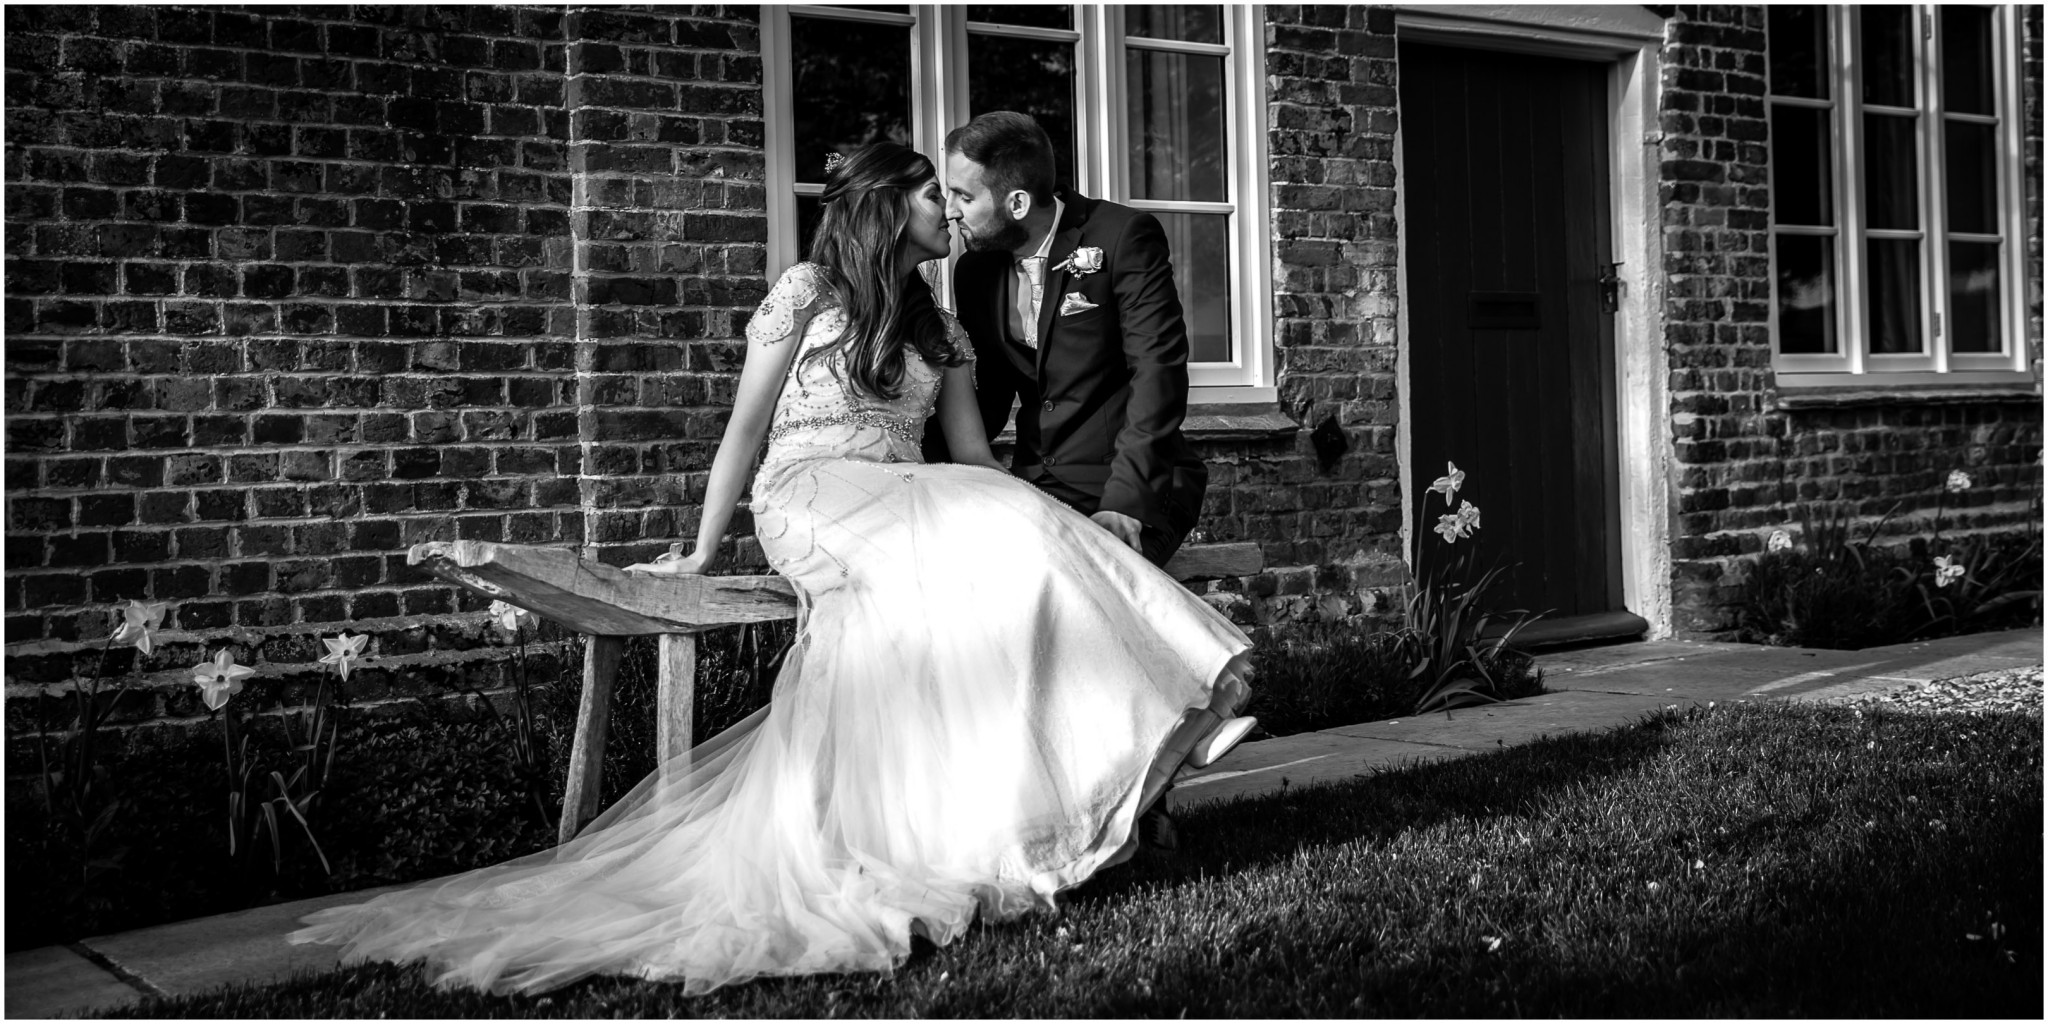 Wasing Park Wedding Photography Bride & Groom kissing